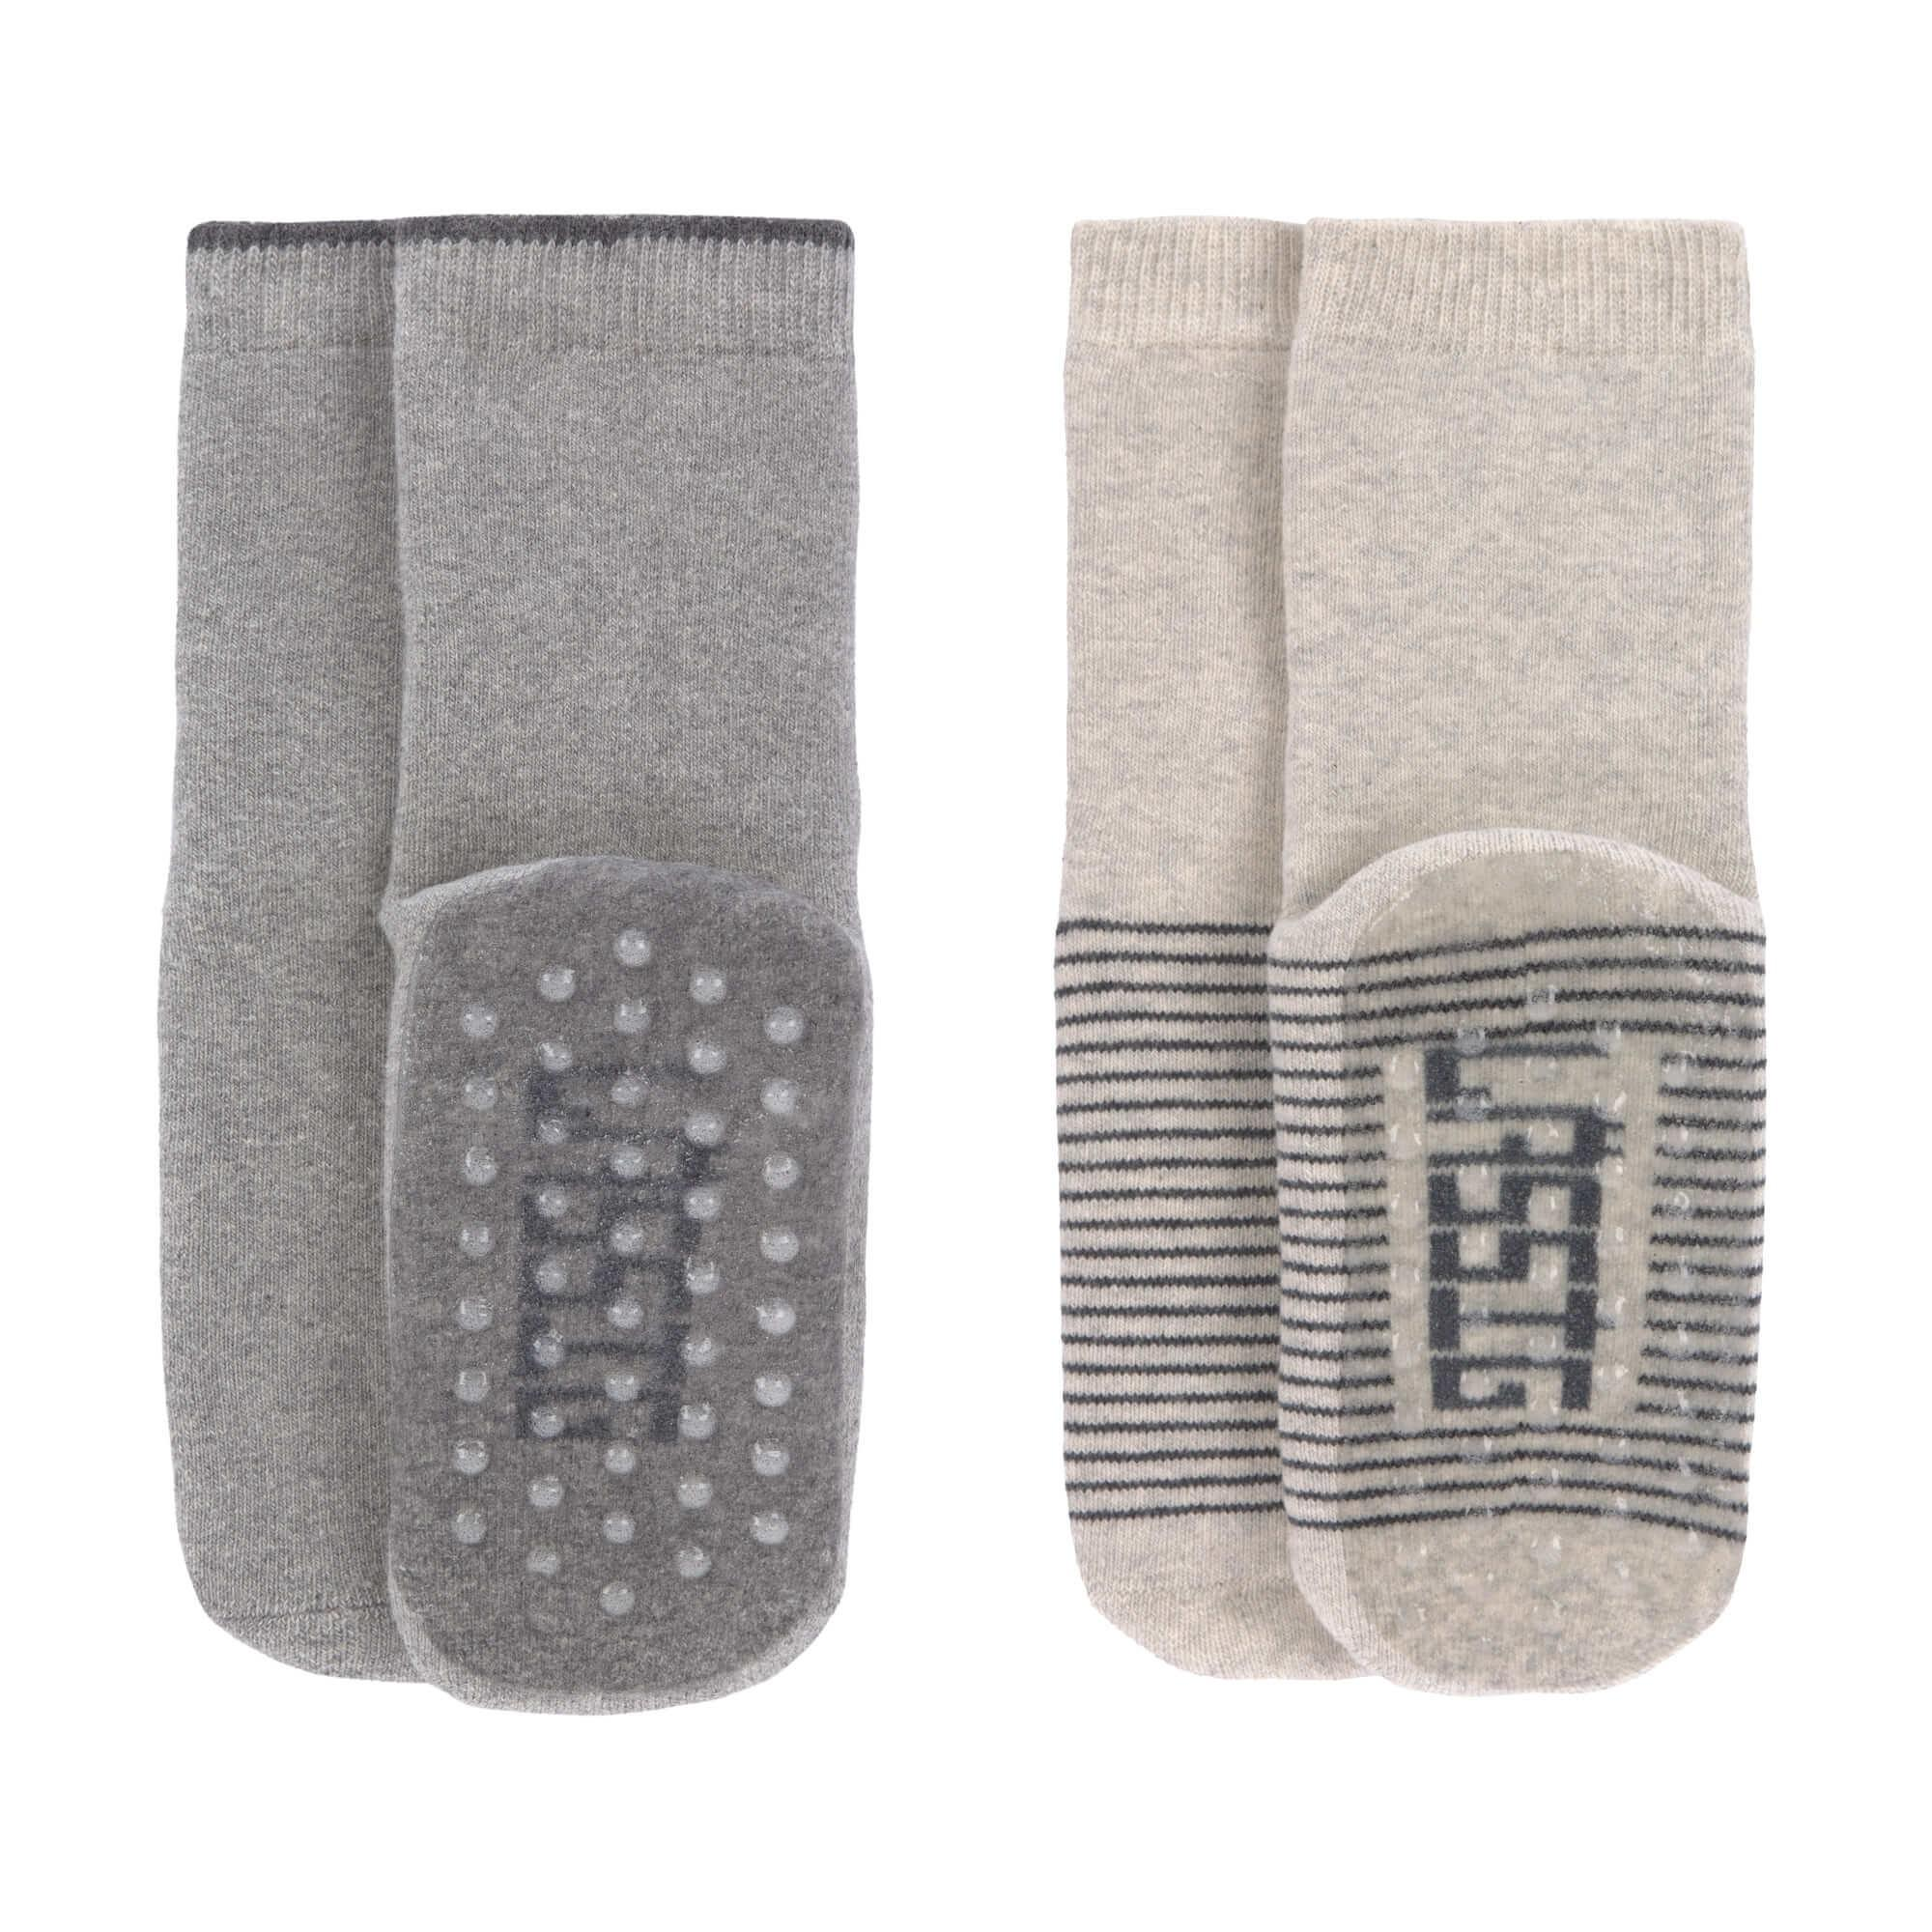 Lassig - Anti-slip Socks 2 pcs. assorted grey/beige, Size: 23-26